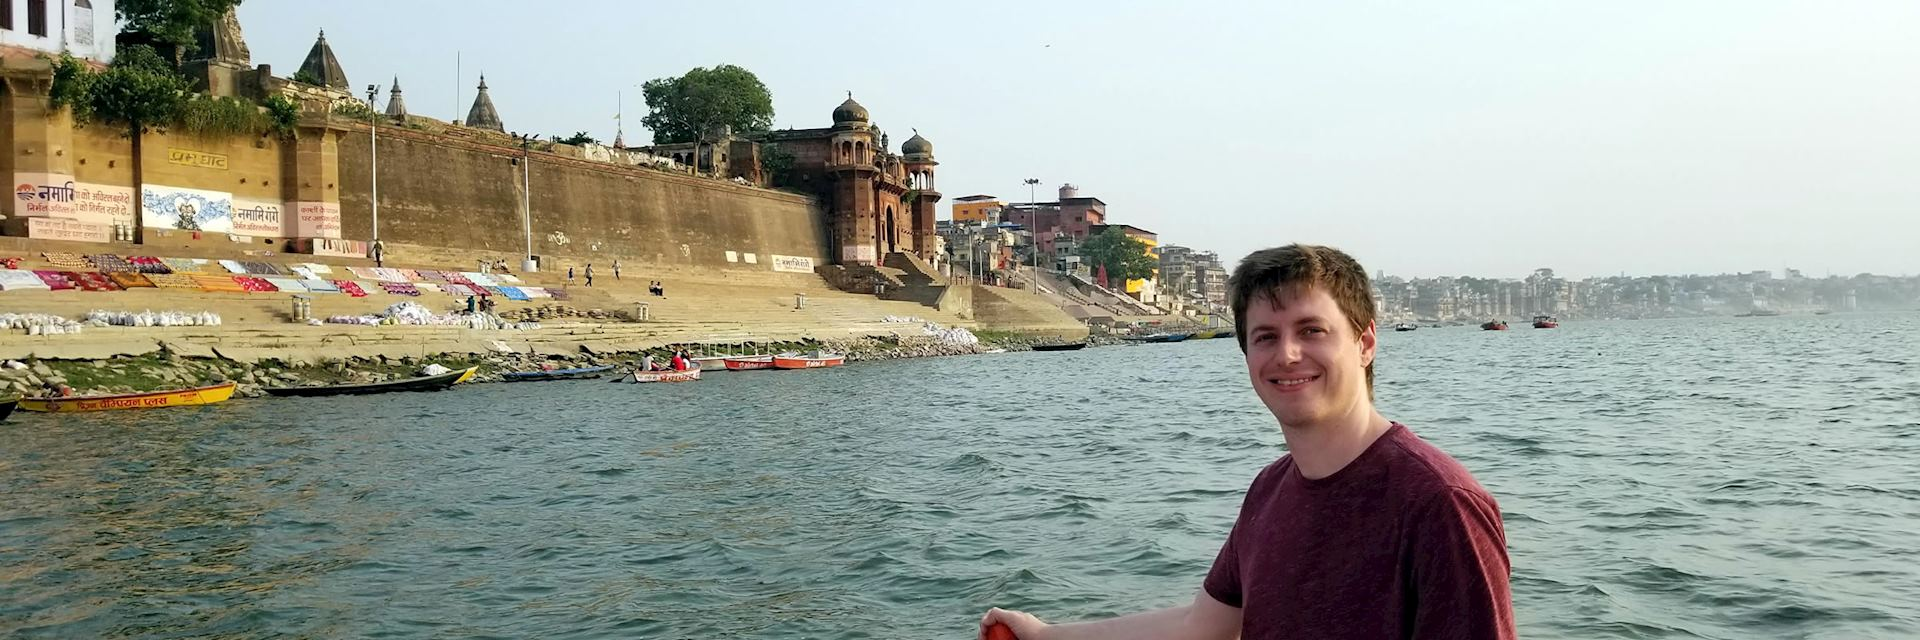 Jackson in Varanasi, India